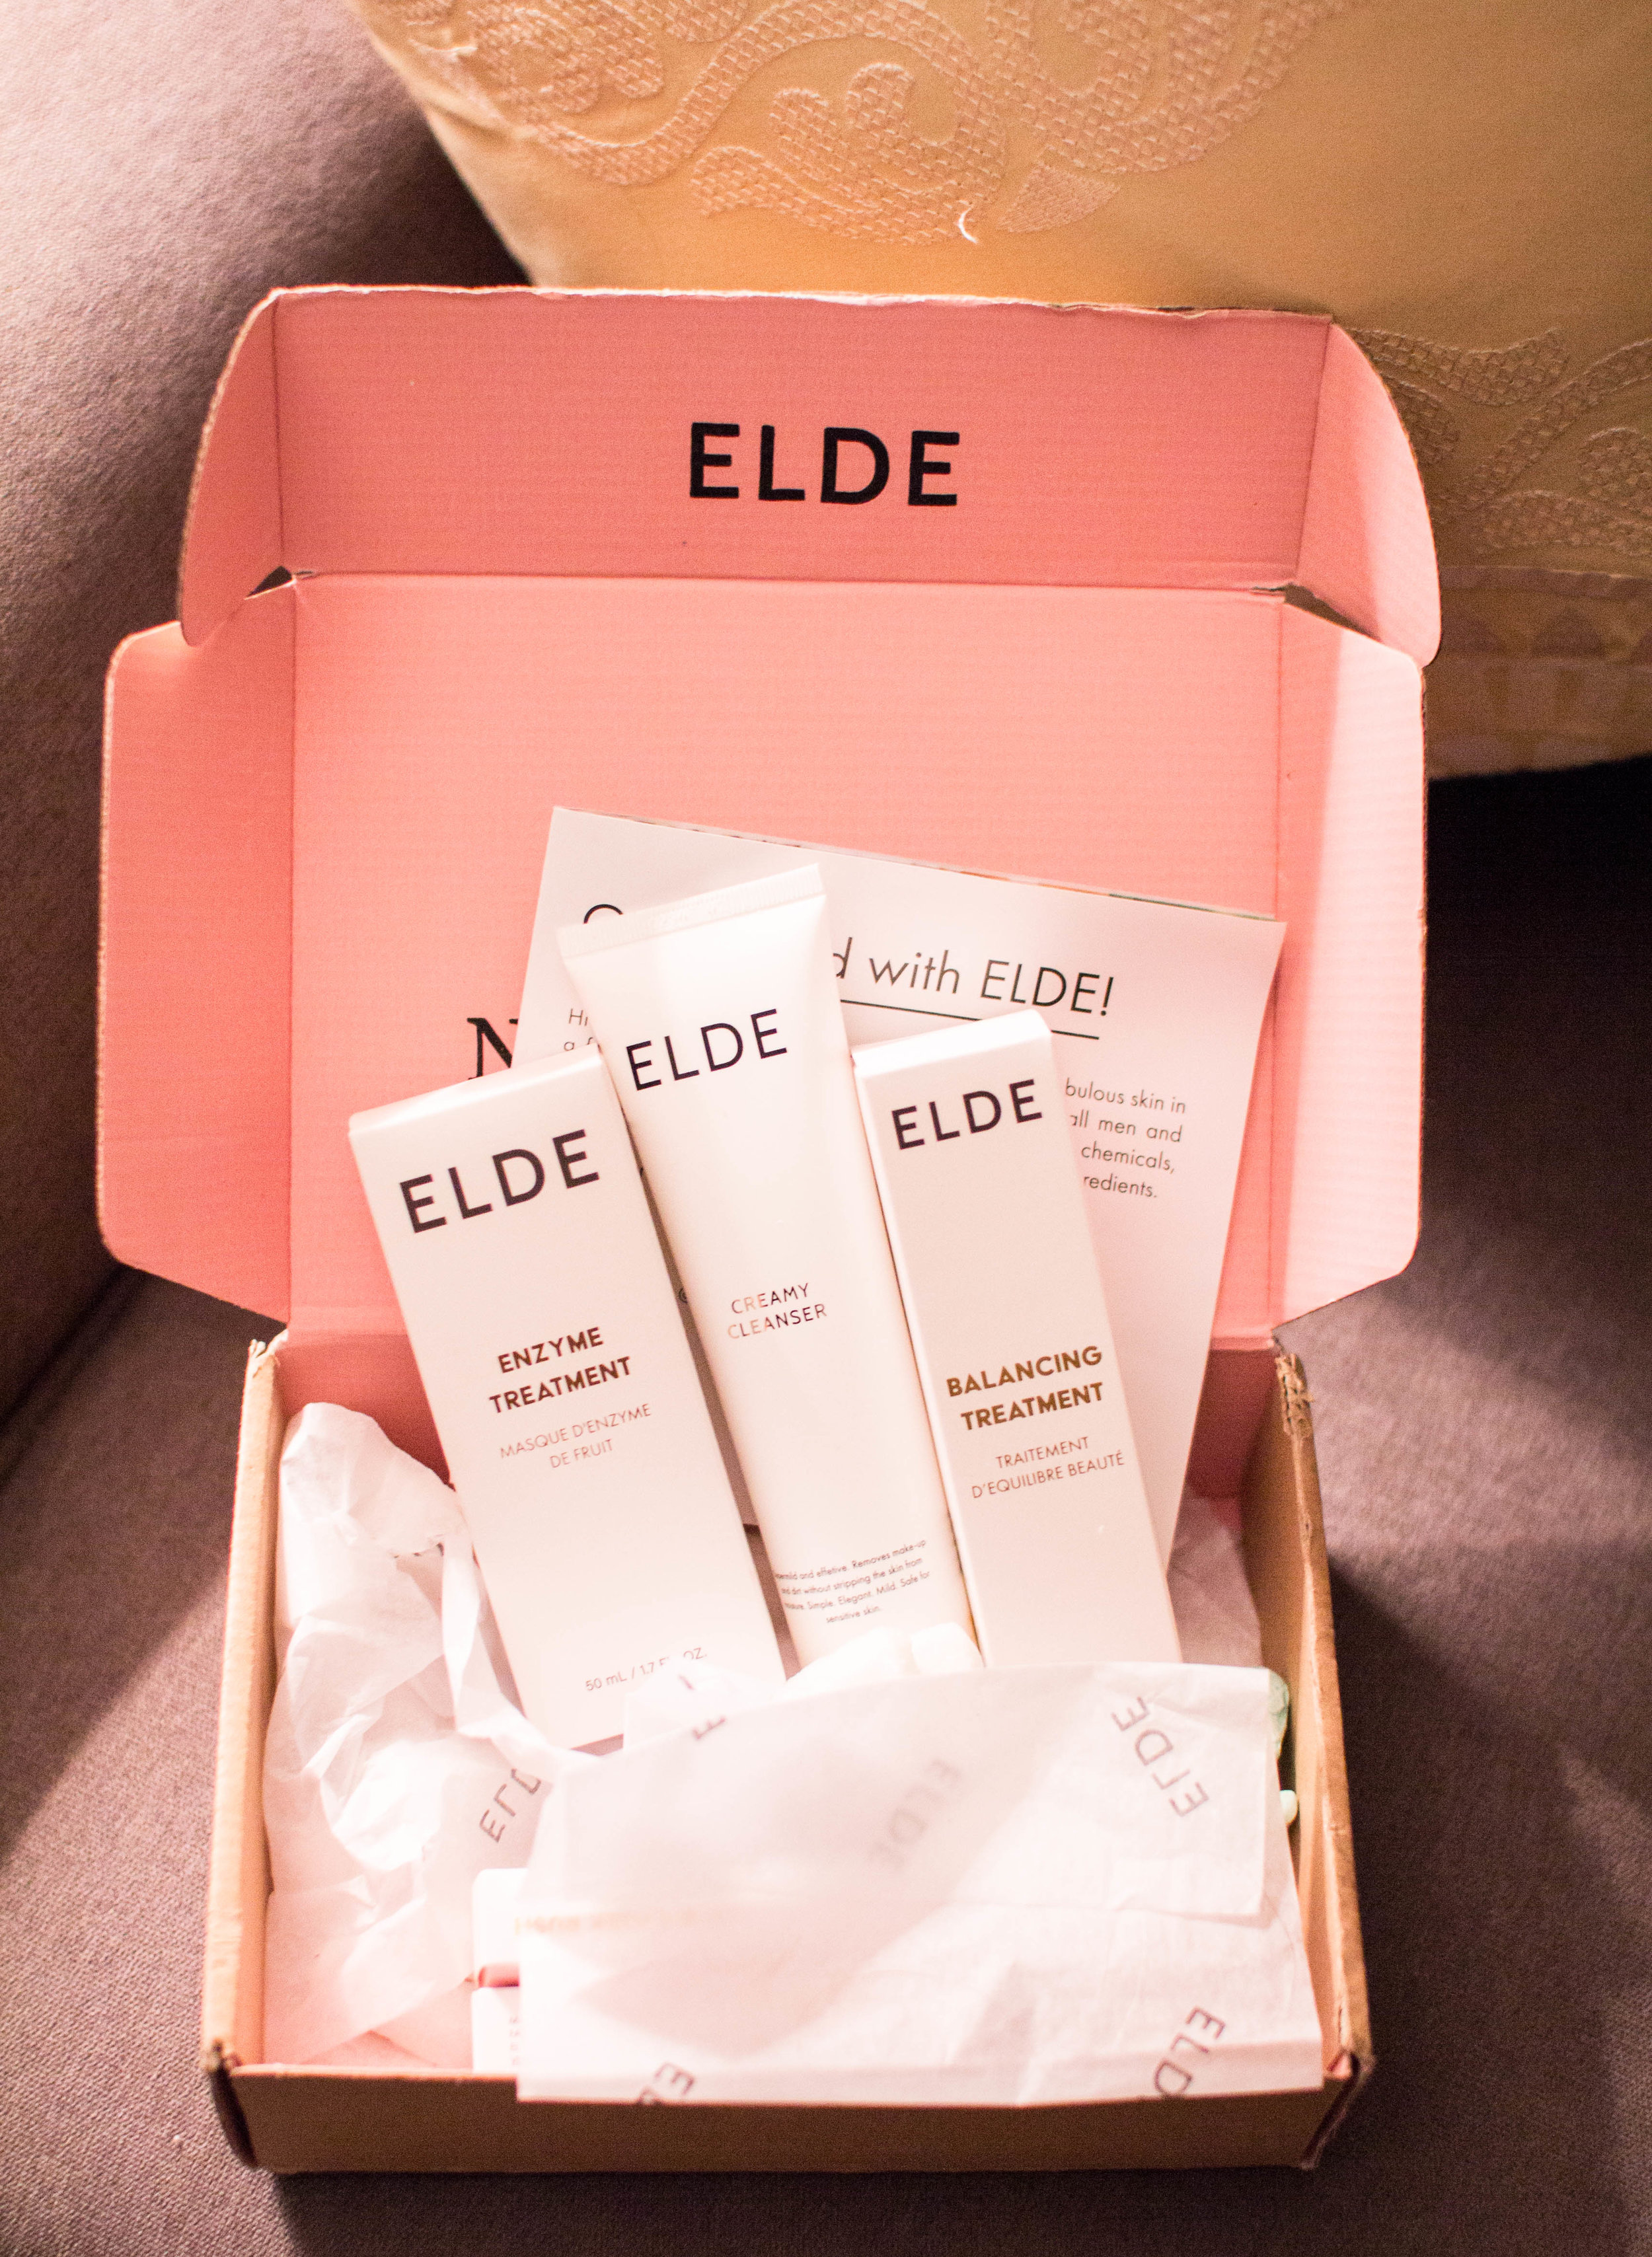 Unboxing + ELDE Skincare Review